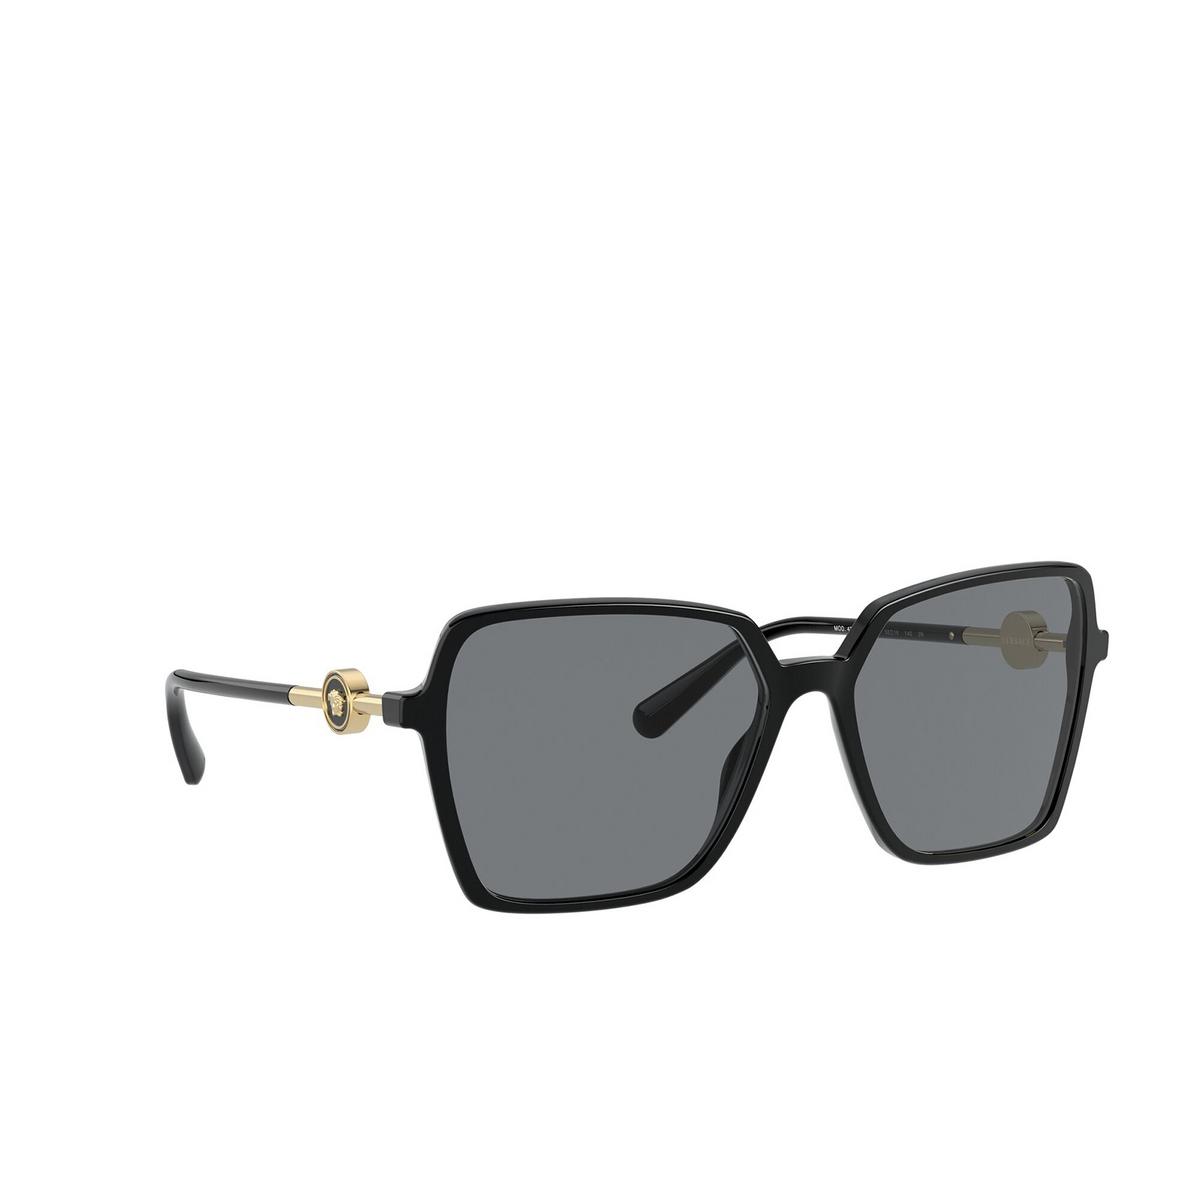 Versace® Square Sunglasses: VE4396 color Black GB1/87 - three-quarters view.